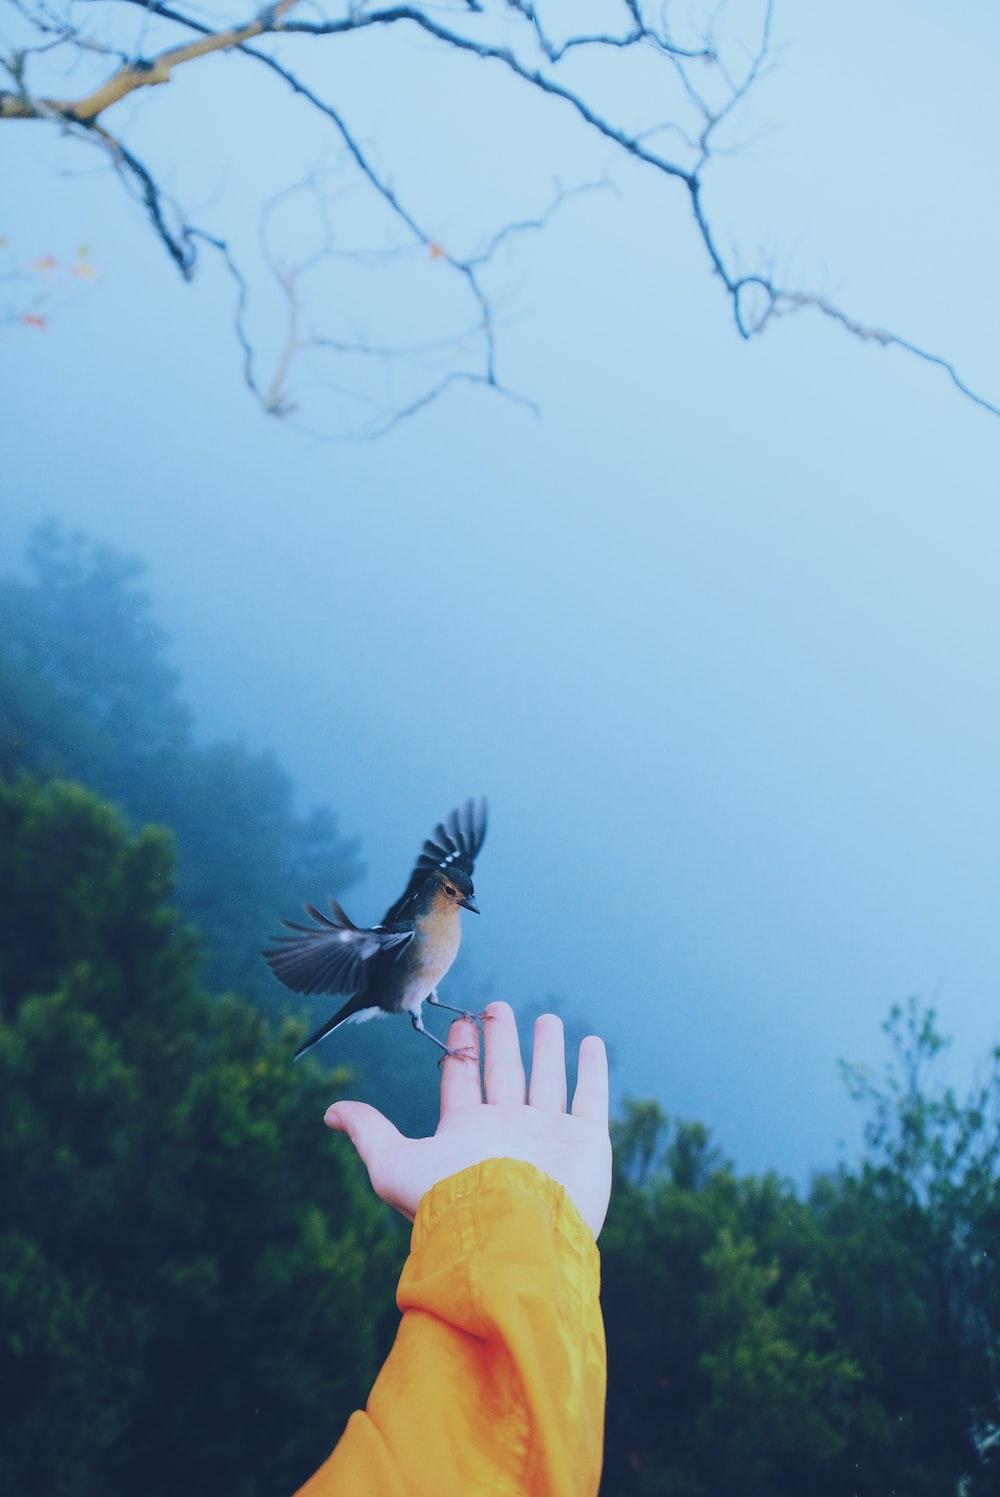 black and white bird perching on human hand